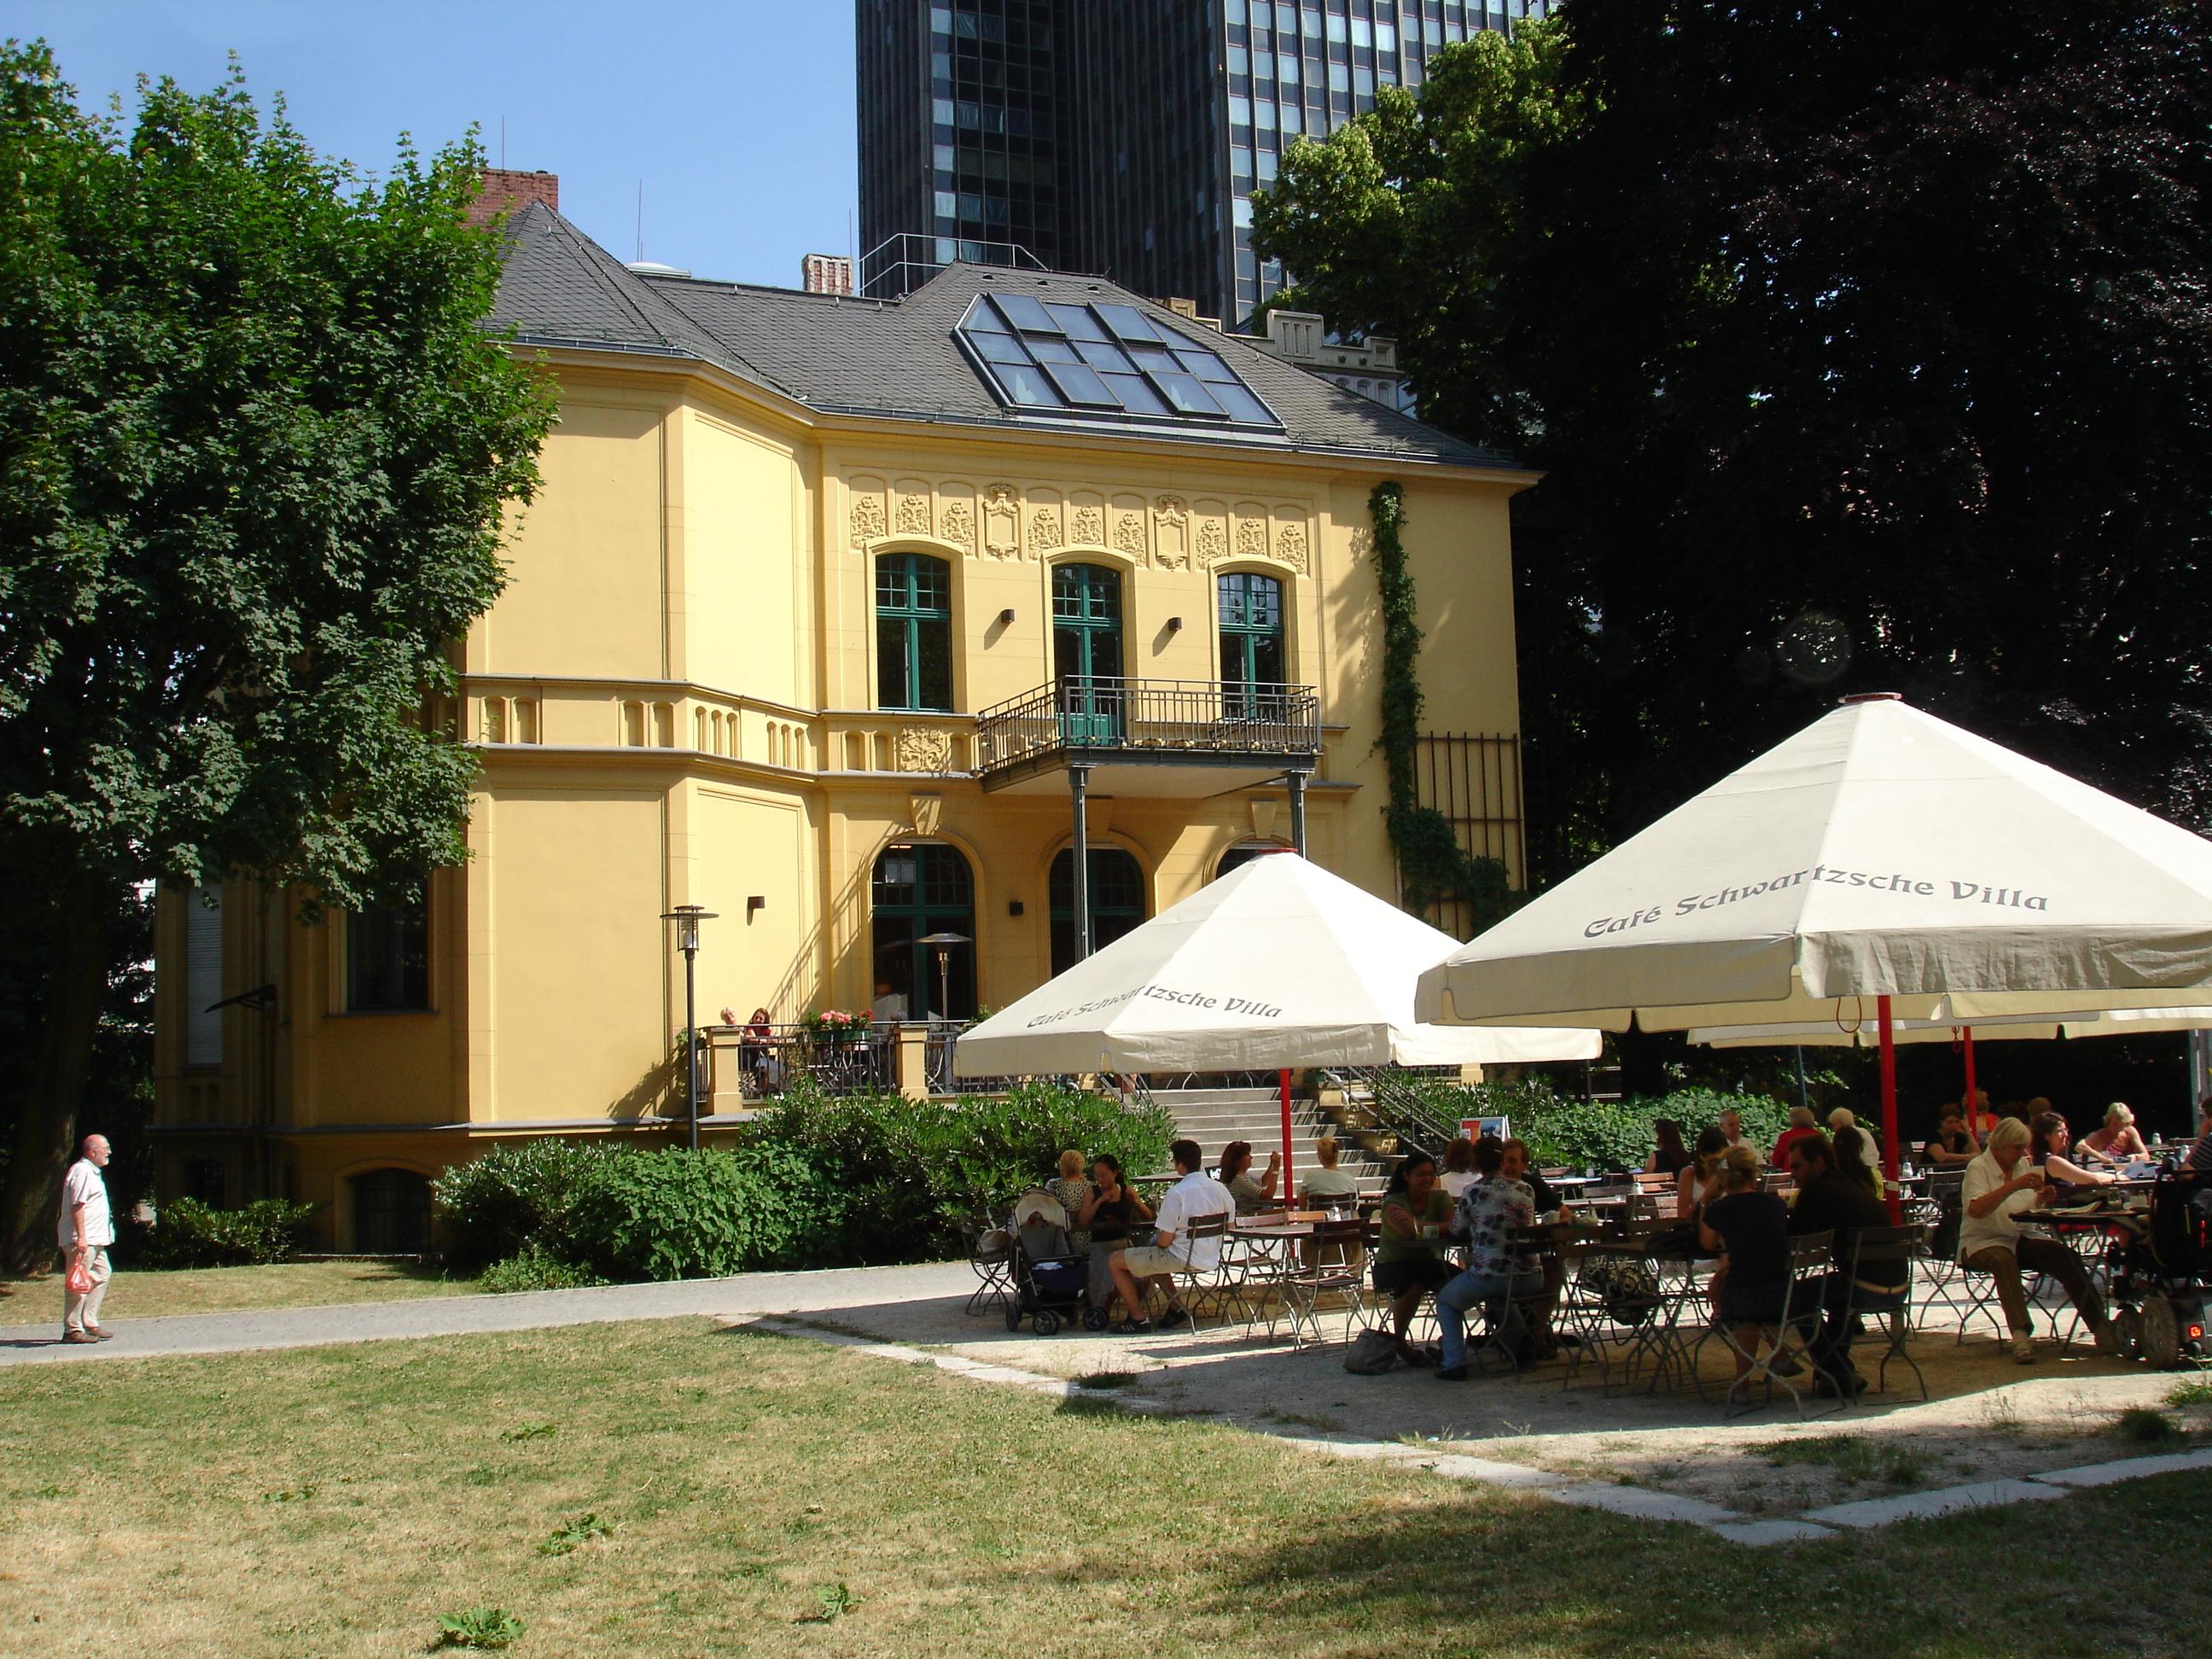 Kubinaut - Schwartzsche Villa